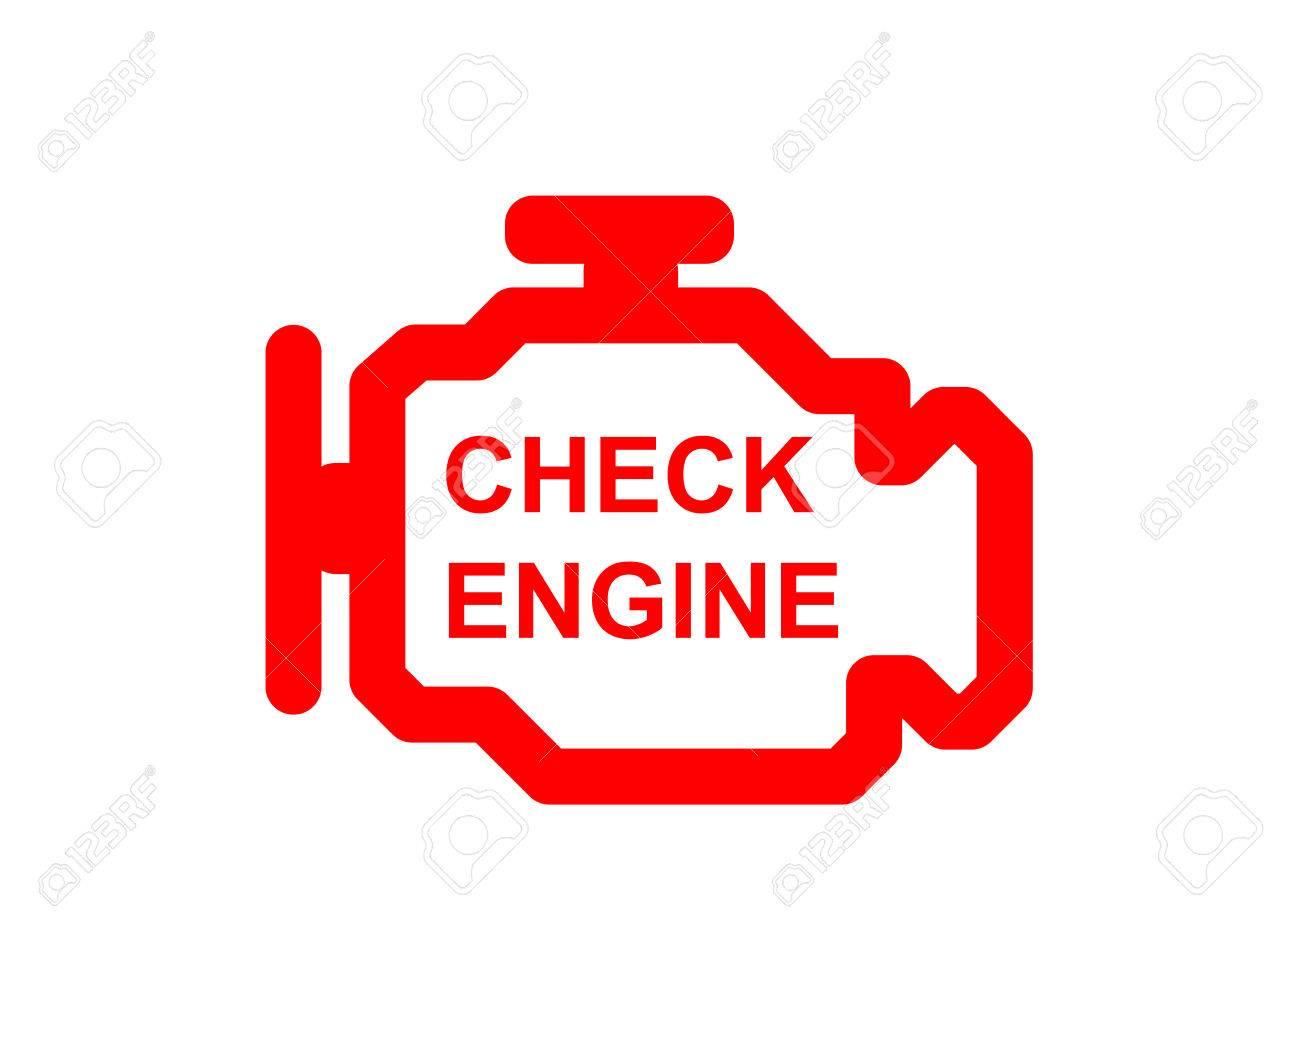 Malfunction or check engine car symbol, dash board close up - 71609931